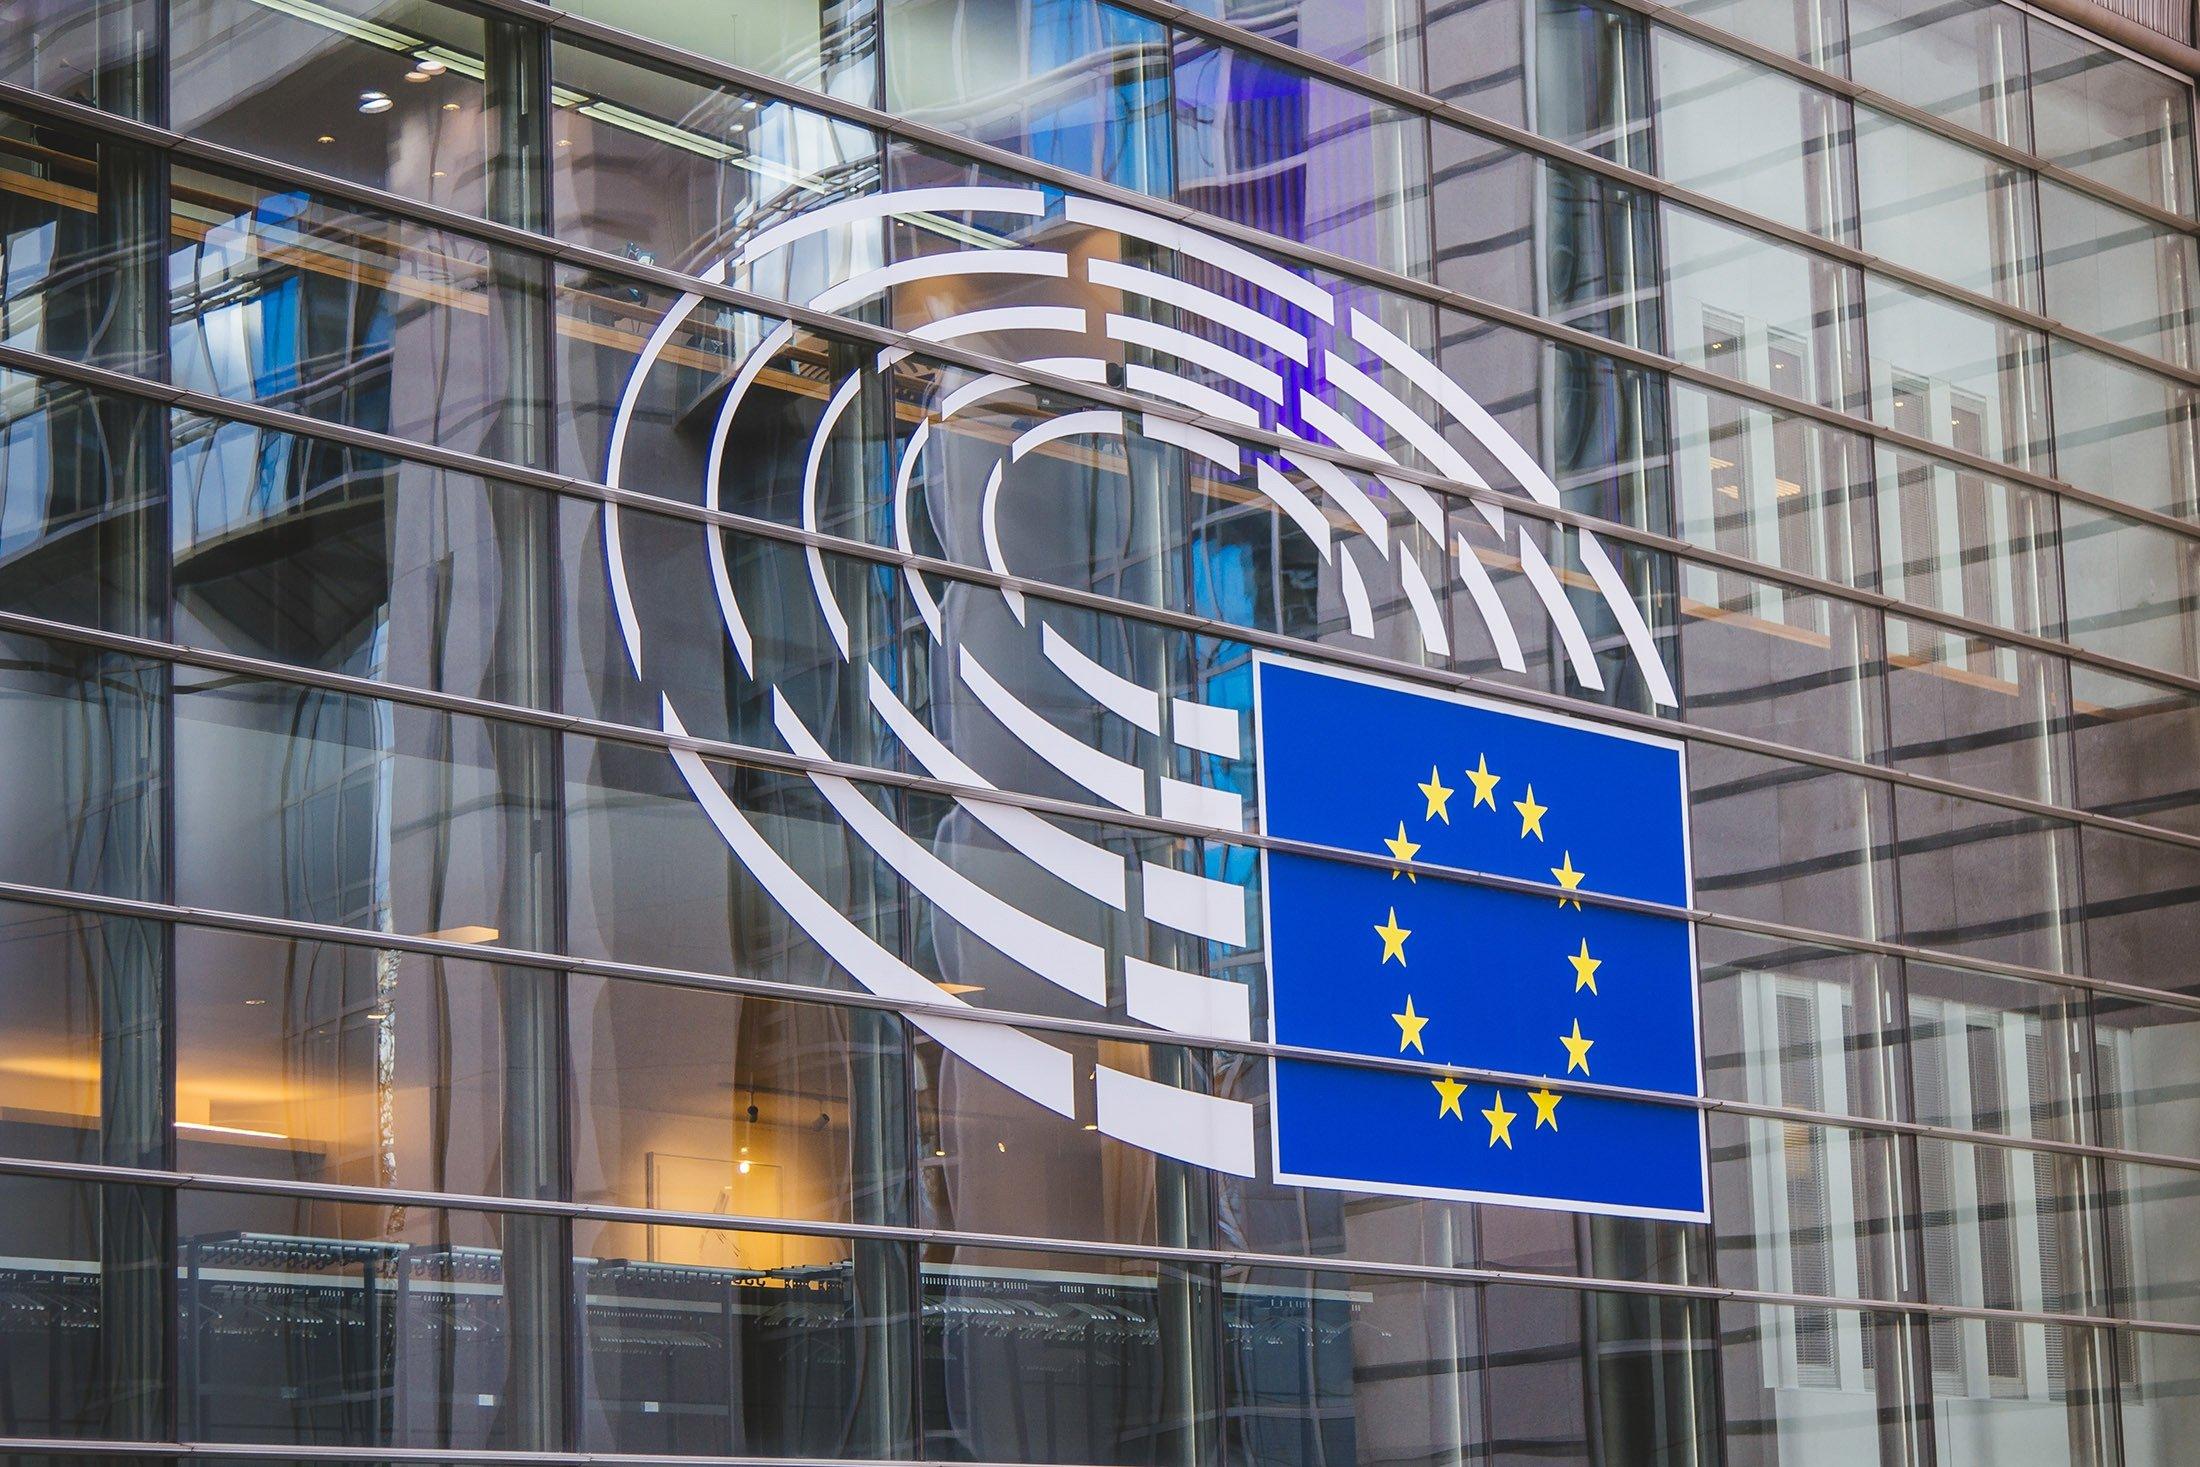 The European Parliament building in Brussels, Belgium. (Shutterstock Photo)